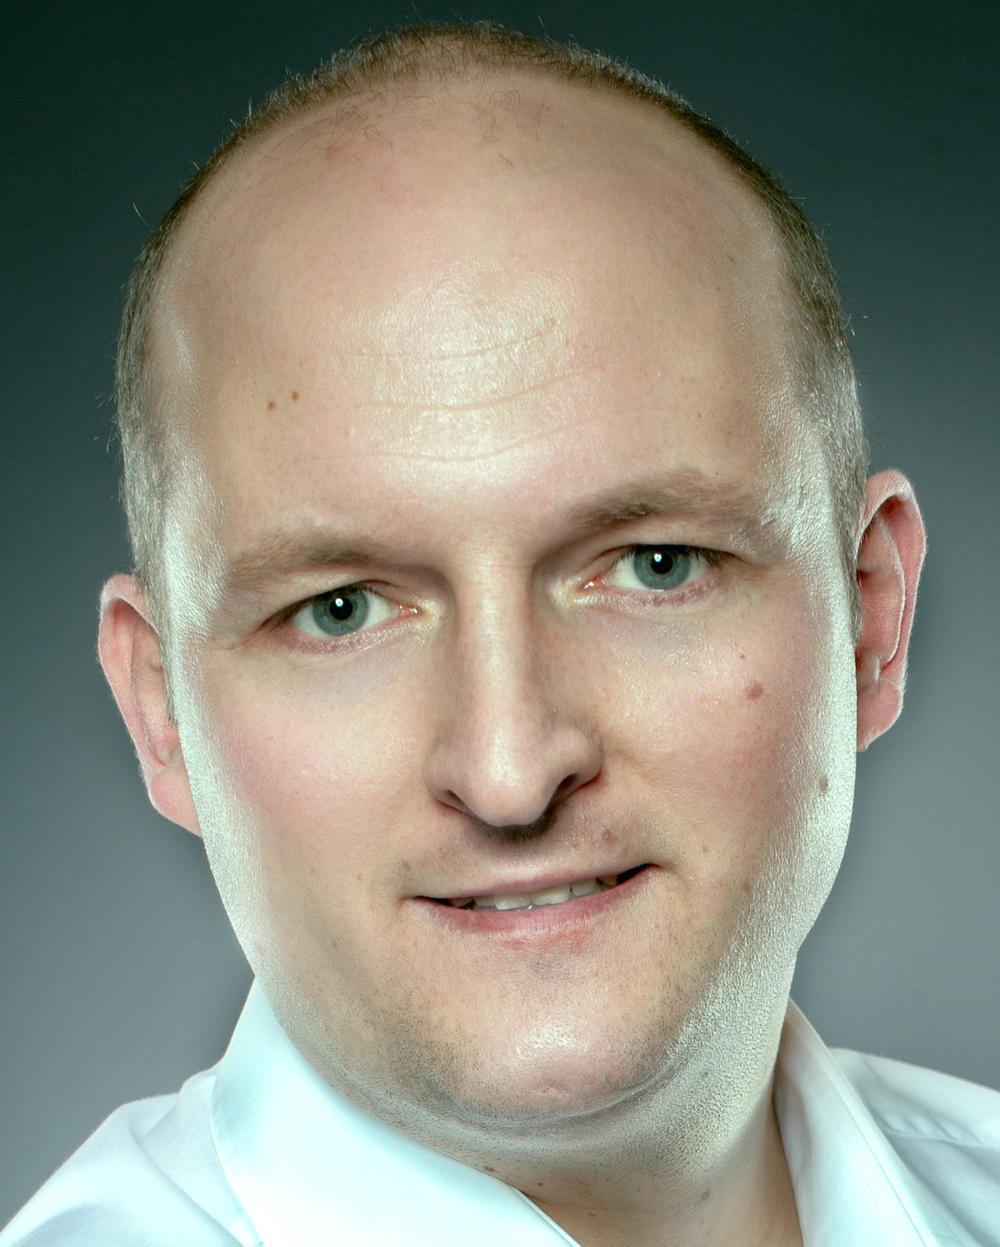 Tino Baumann CFO & Co-Founder of The Urban Institute, Board Member